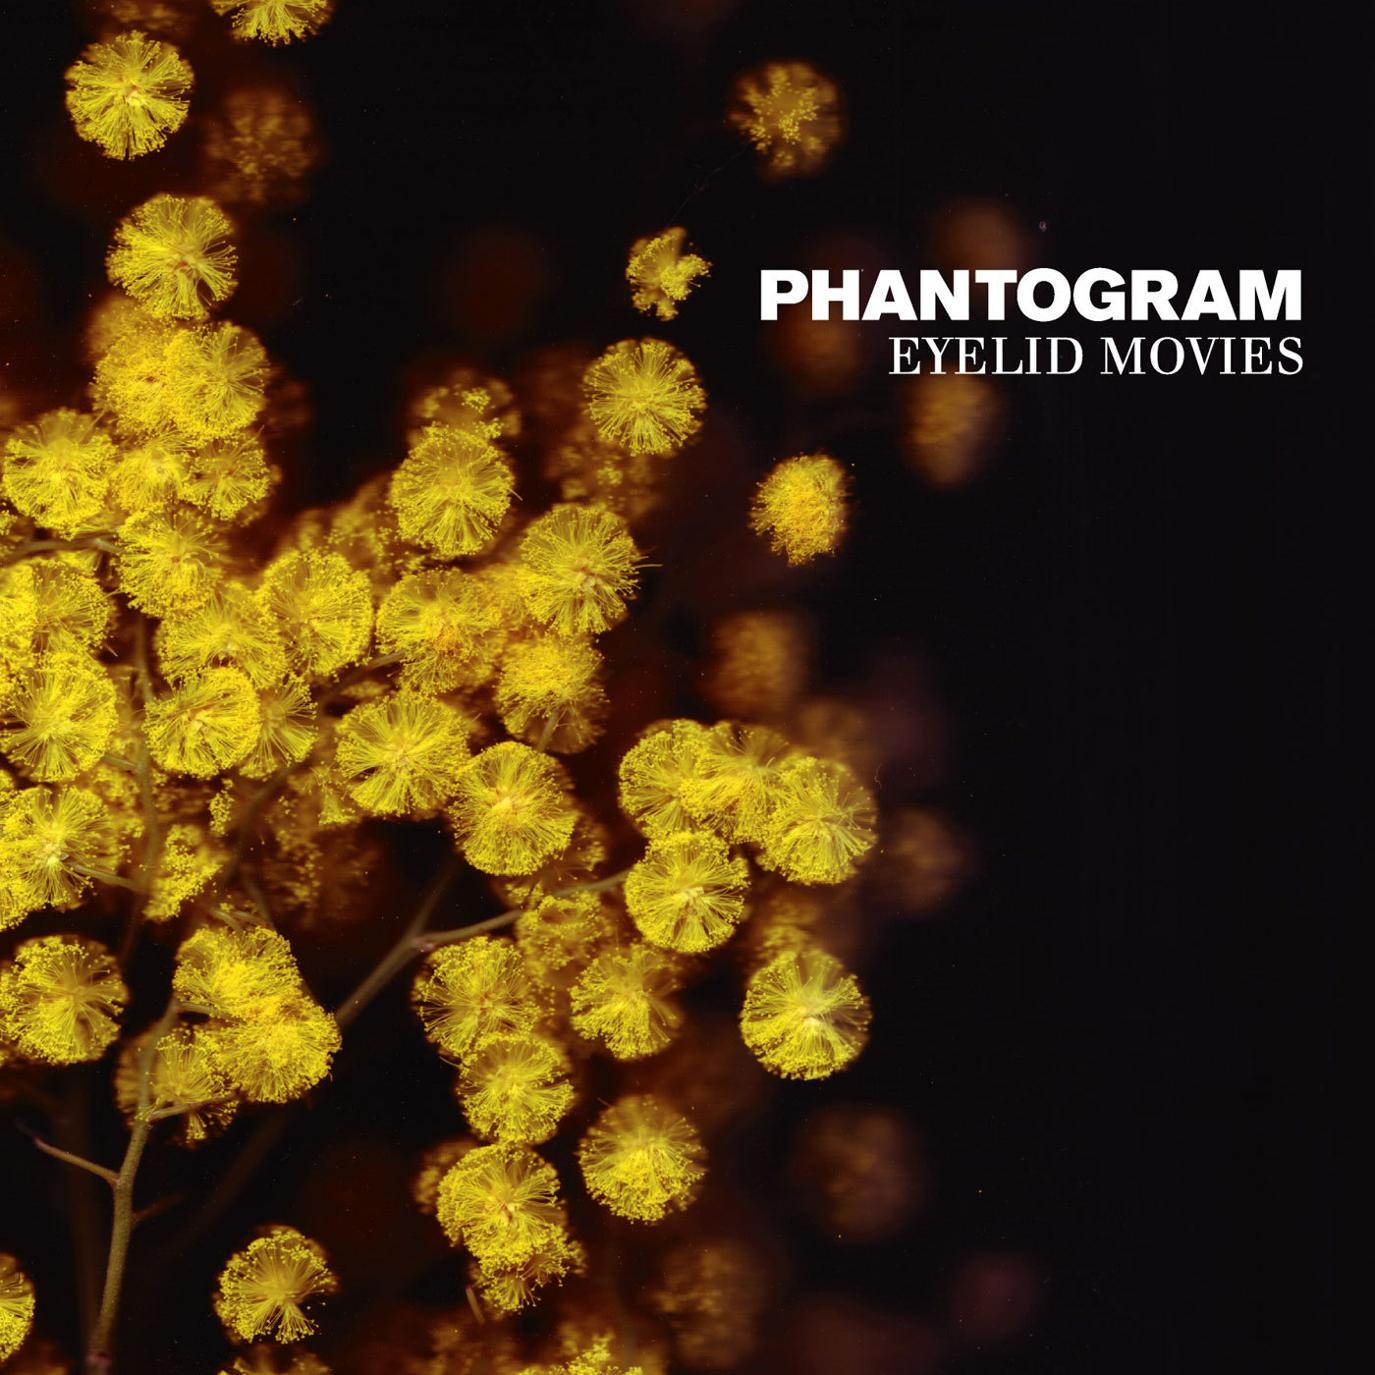 Phantogram, Eyelid Movies